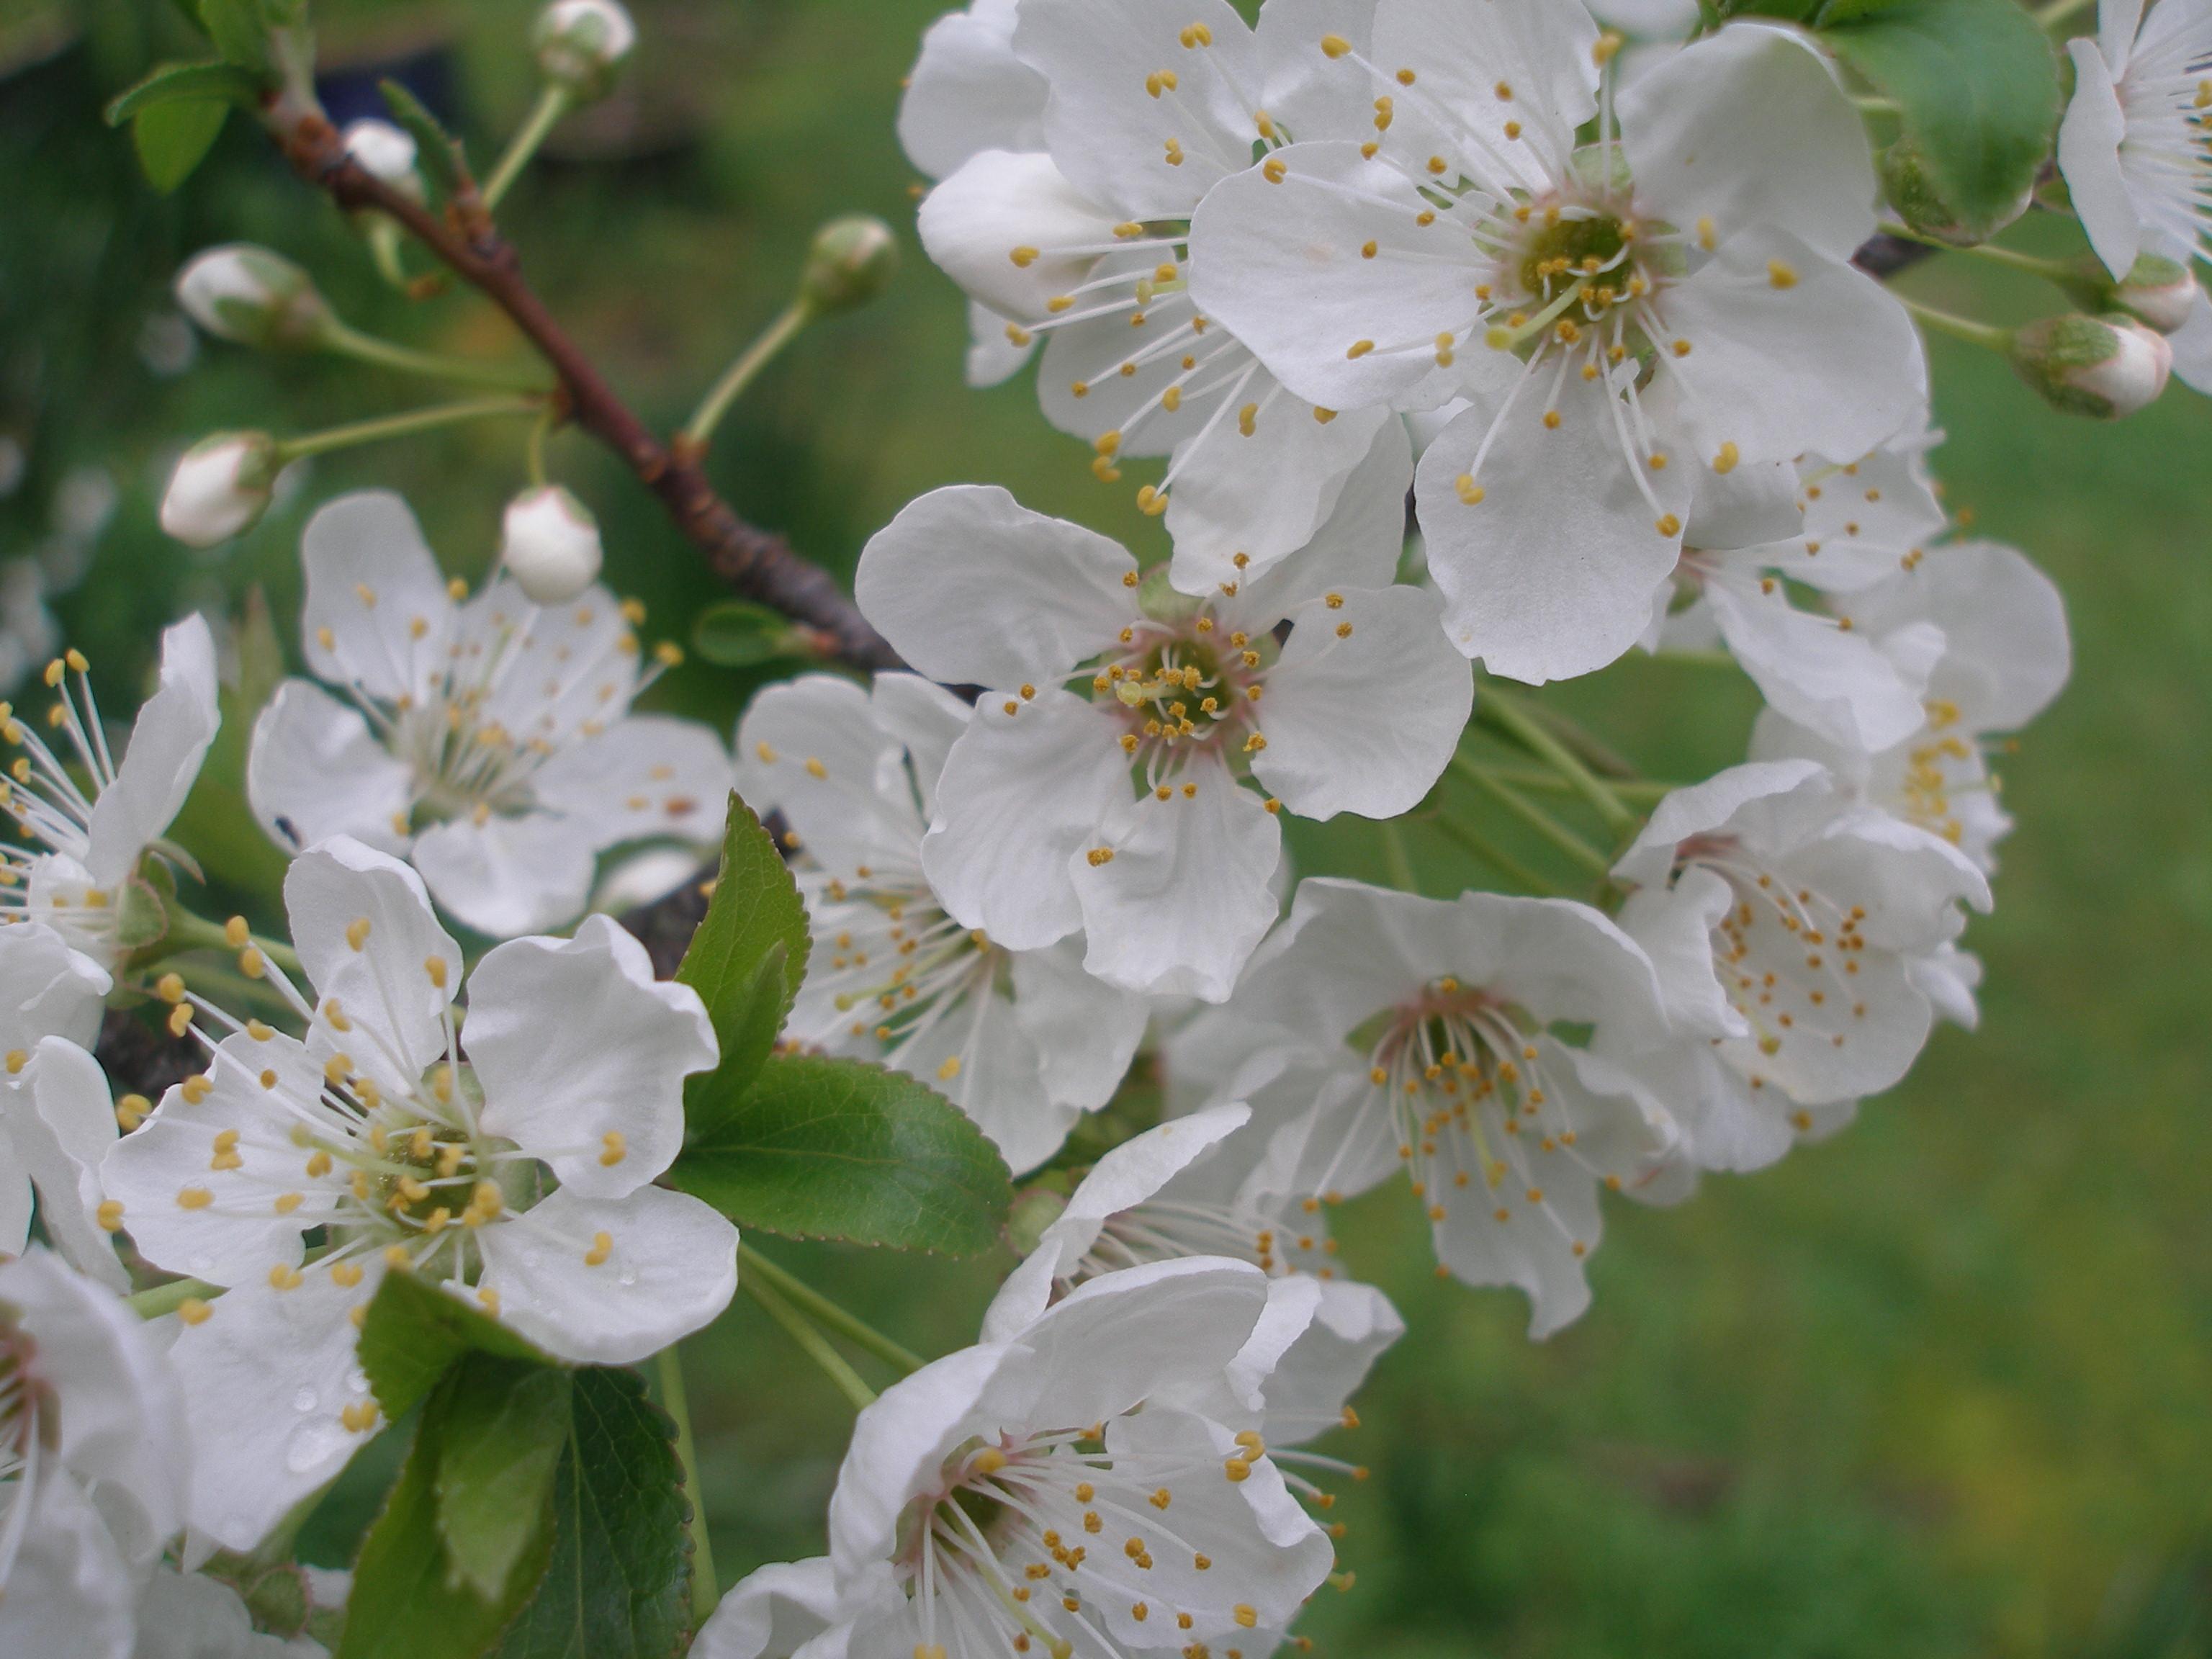 Budding Love: Spring at last!